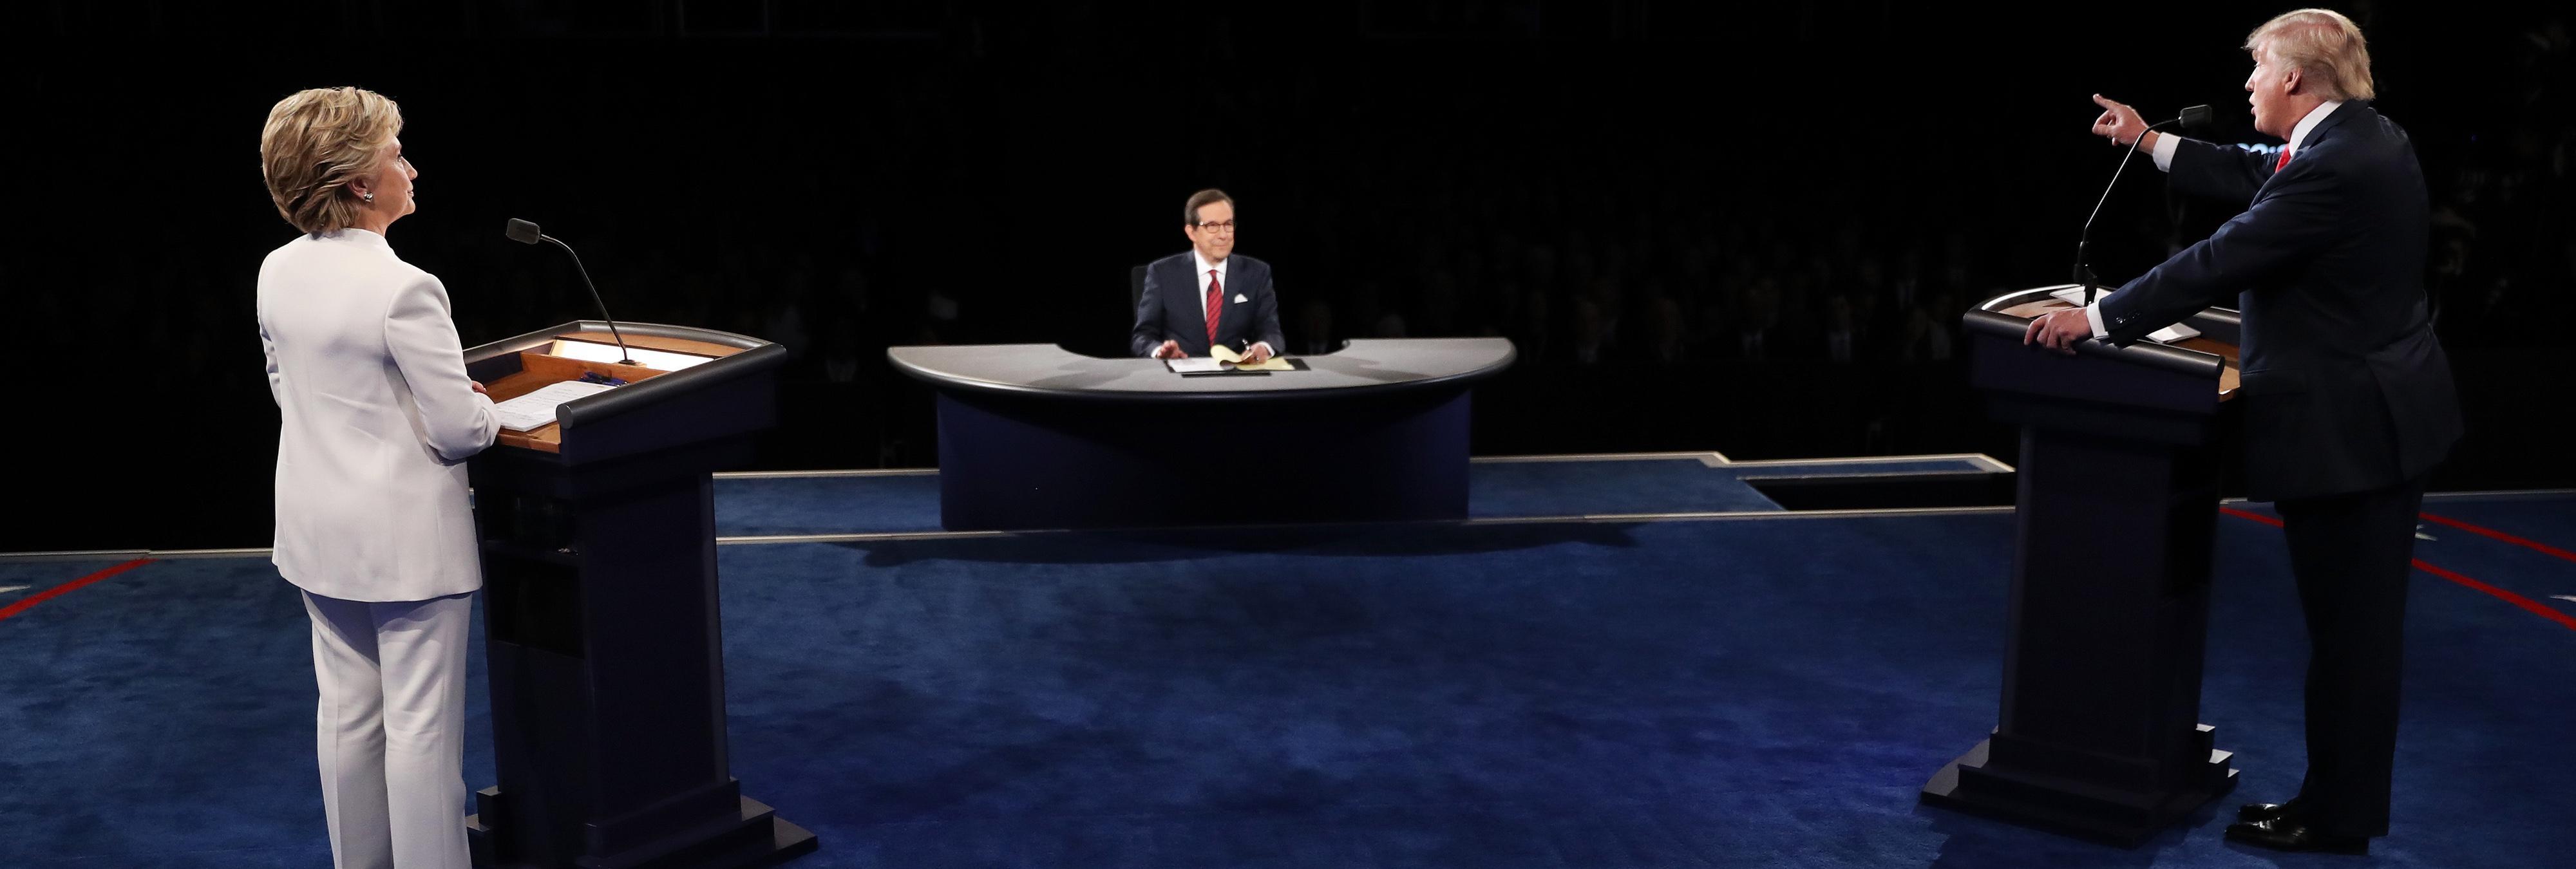 Lo mejores memes del tercer debate Trump vs. Clinton